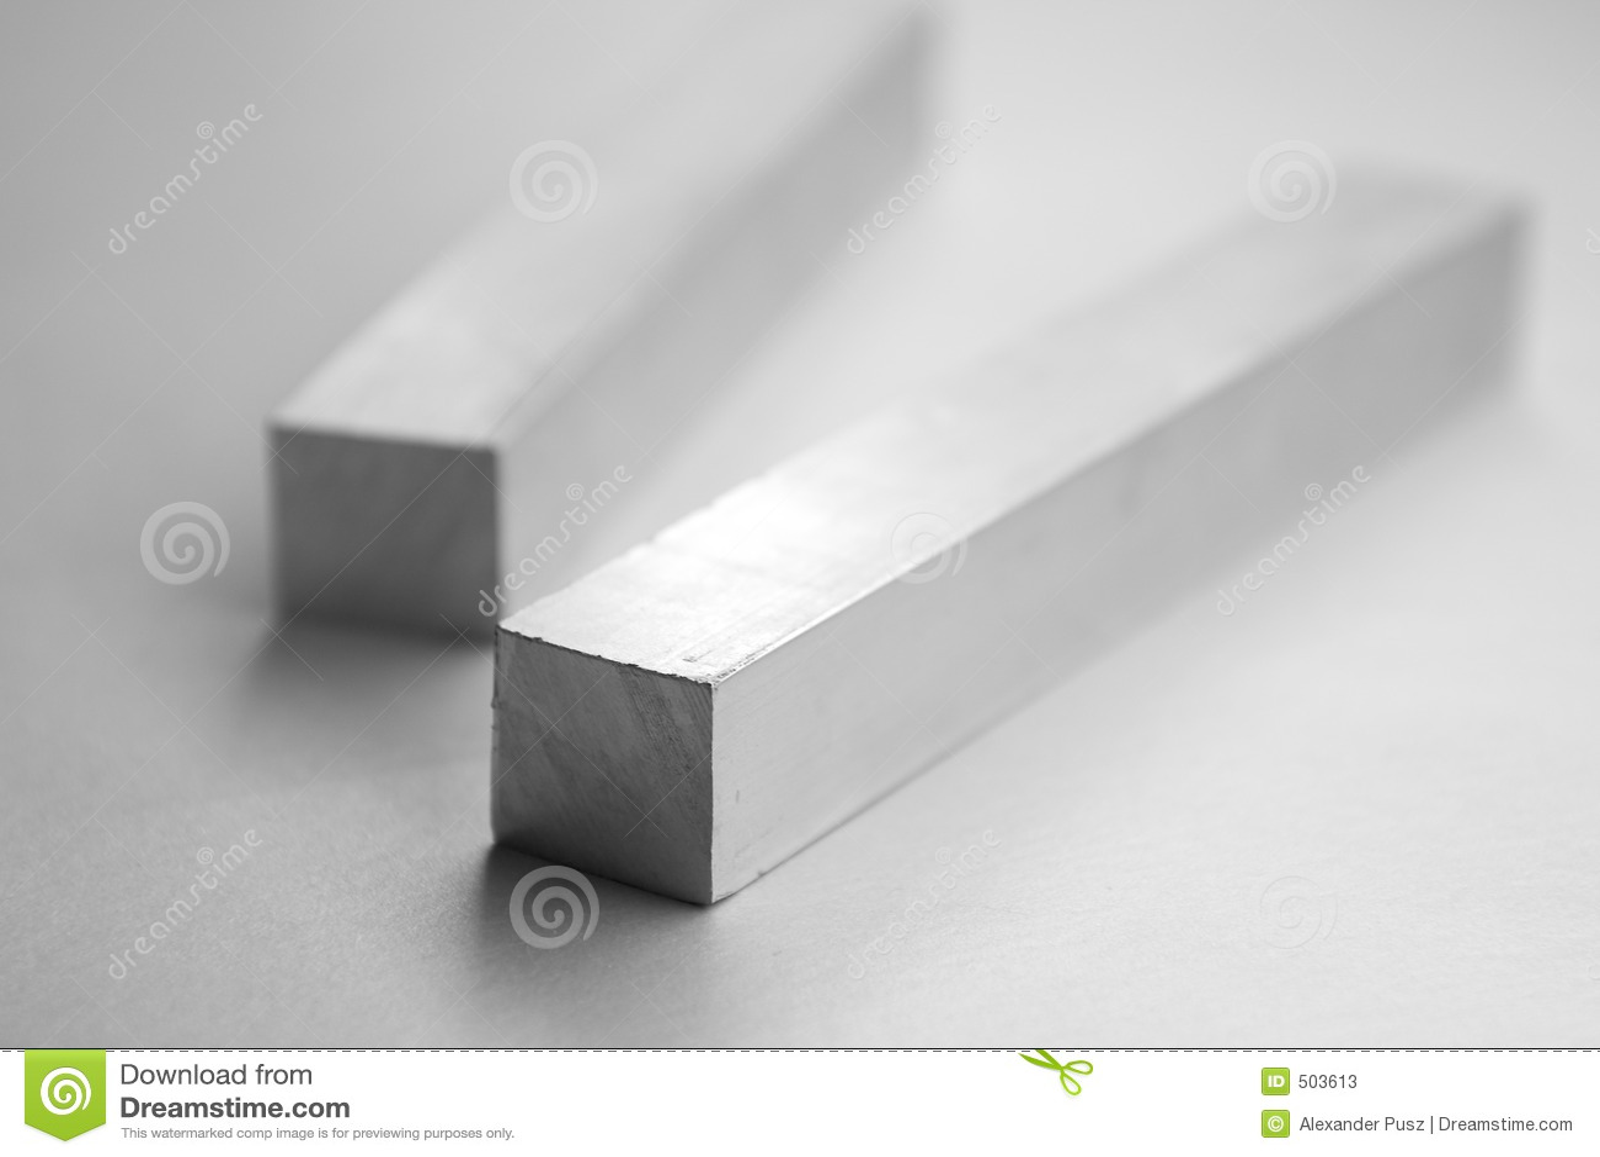 Barras de aluminio fotos de archivo imagen 503613 - Barras de aluminio huecas ...